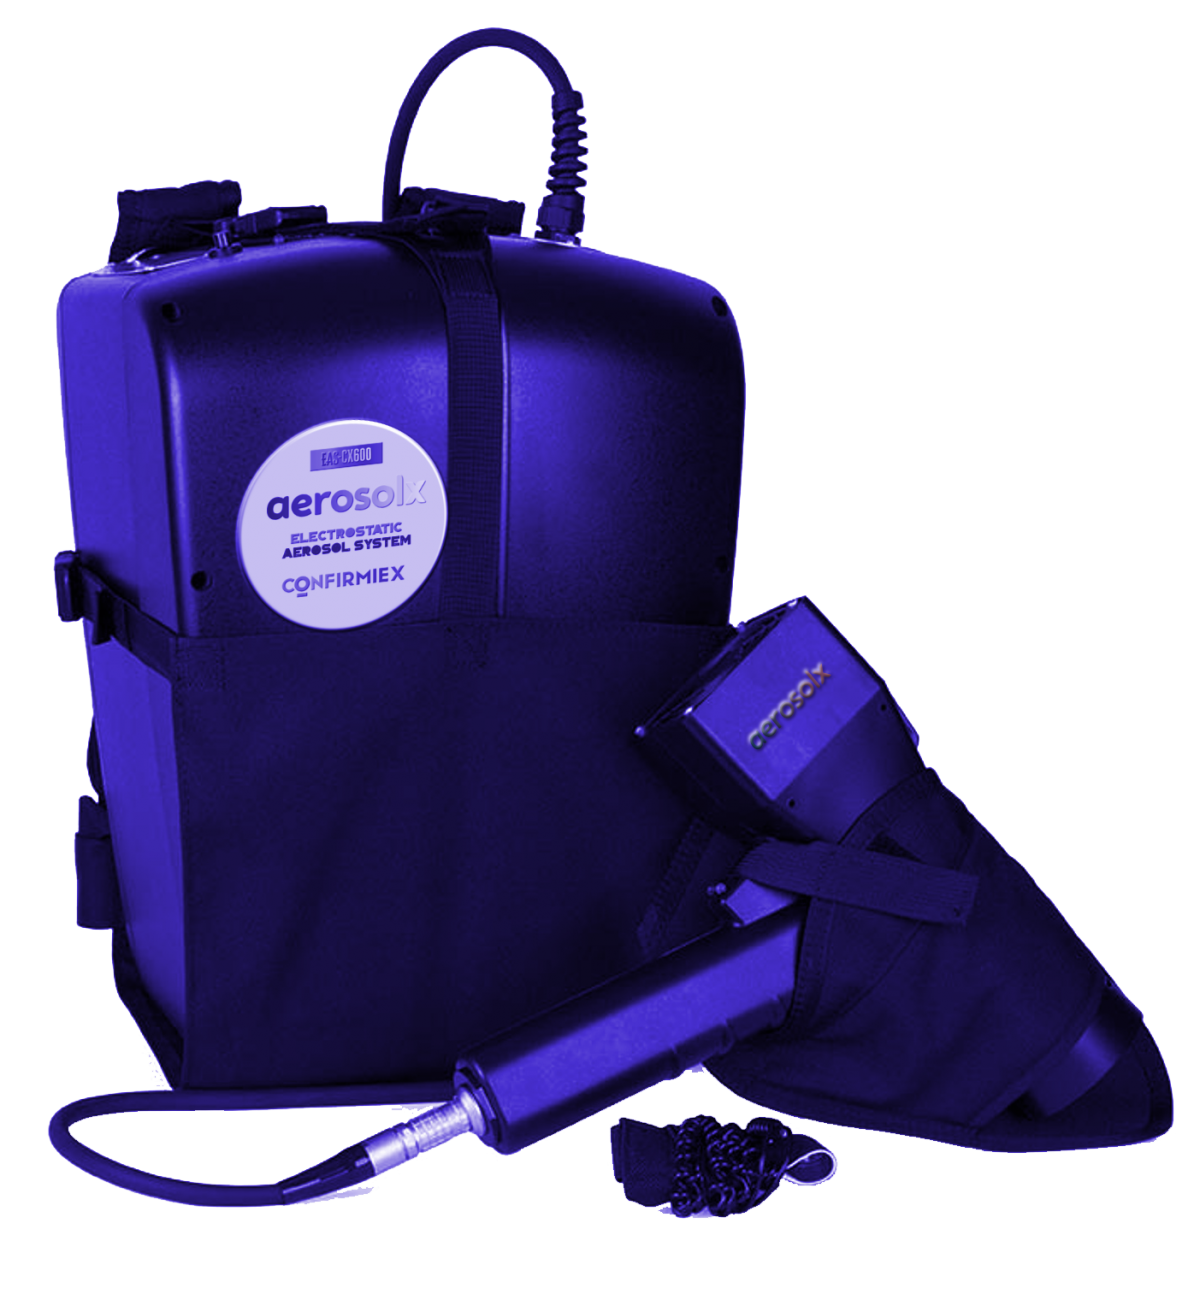 aerosolx-backpack copy